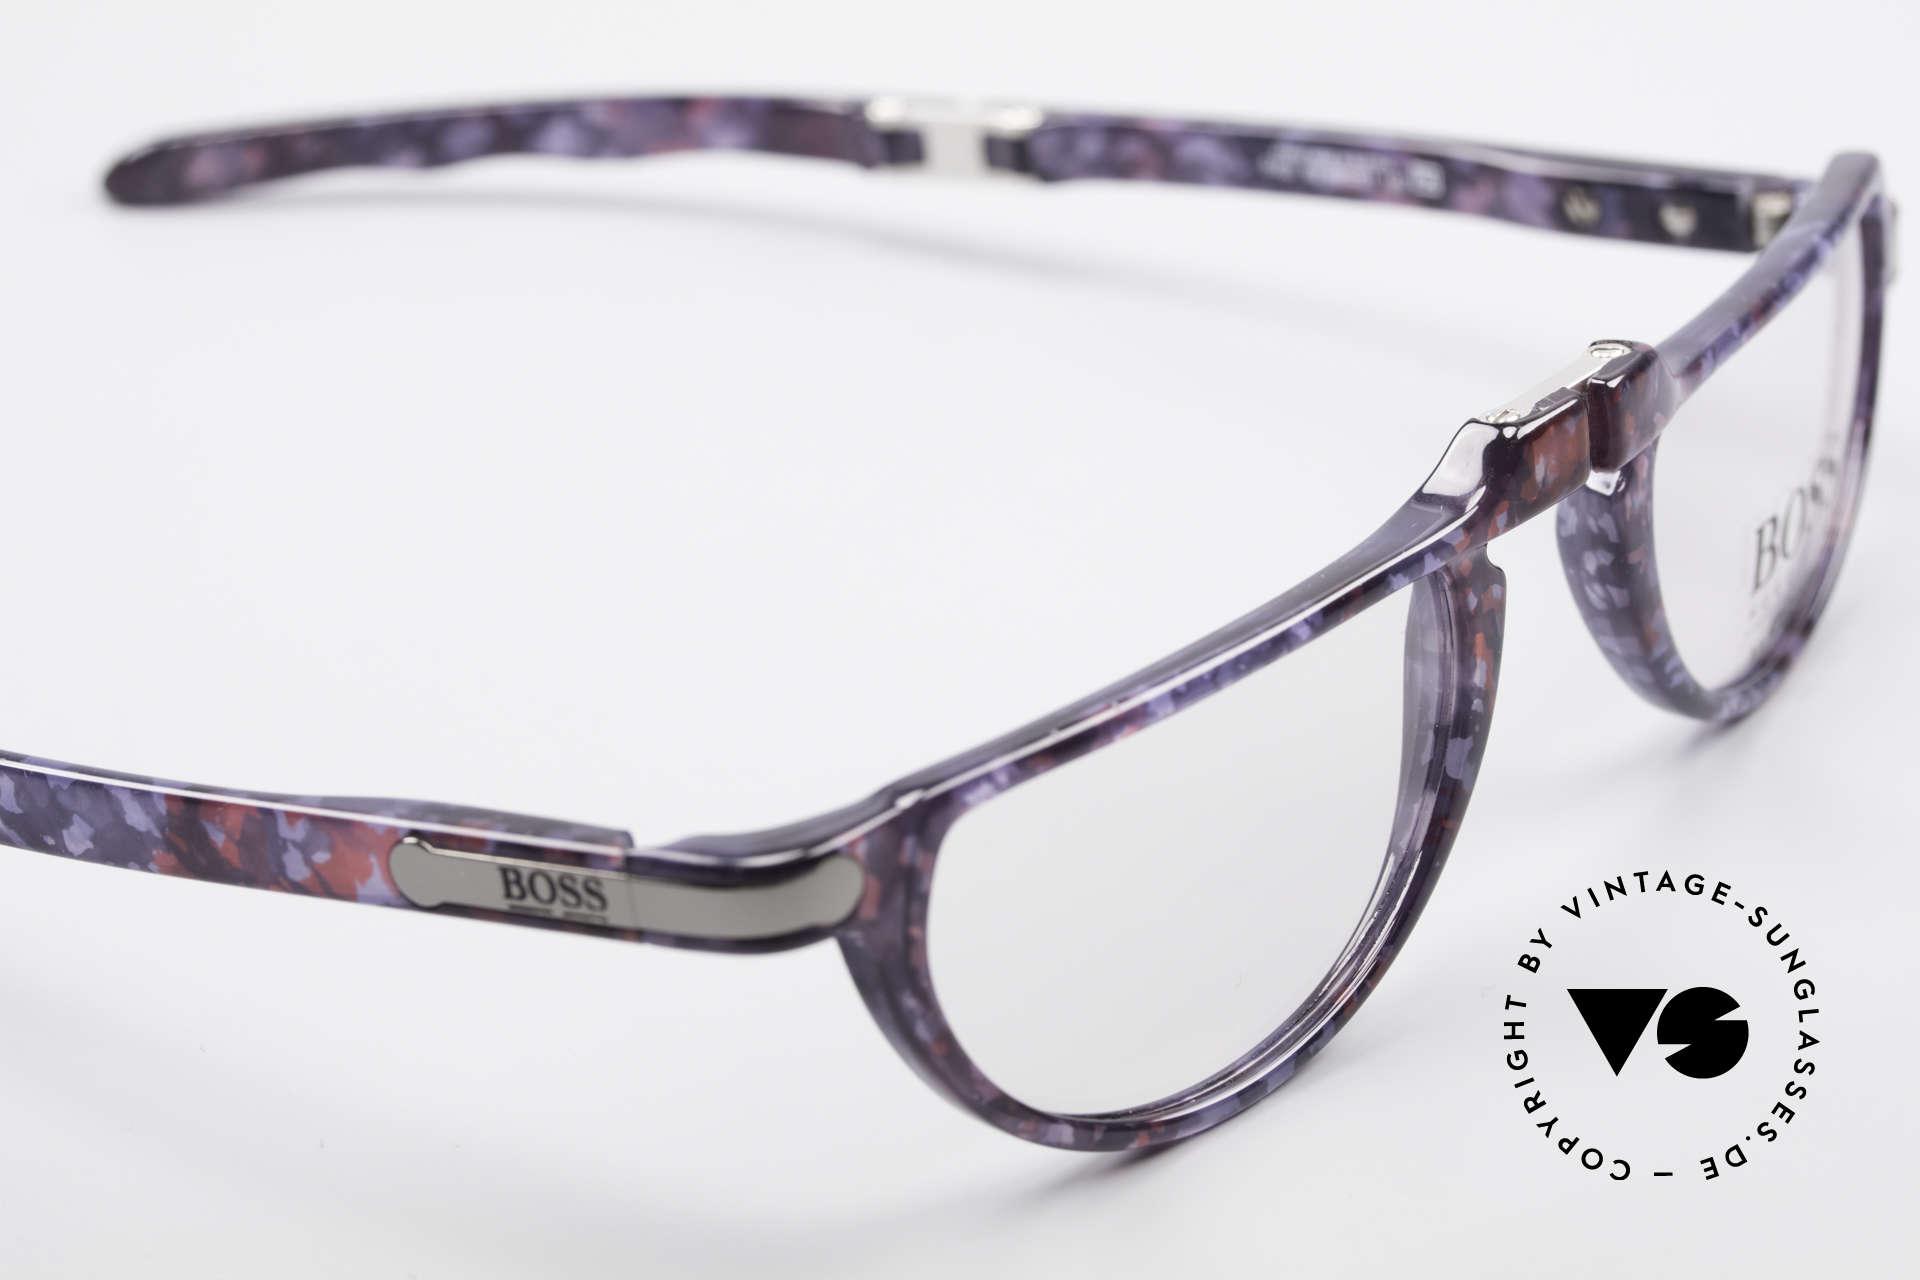 BOSS 5103 Folding Reading Eyeglasses, new old stock (unworn) - incl. a folding hard case, Made for Men and Women